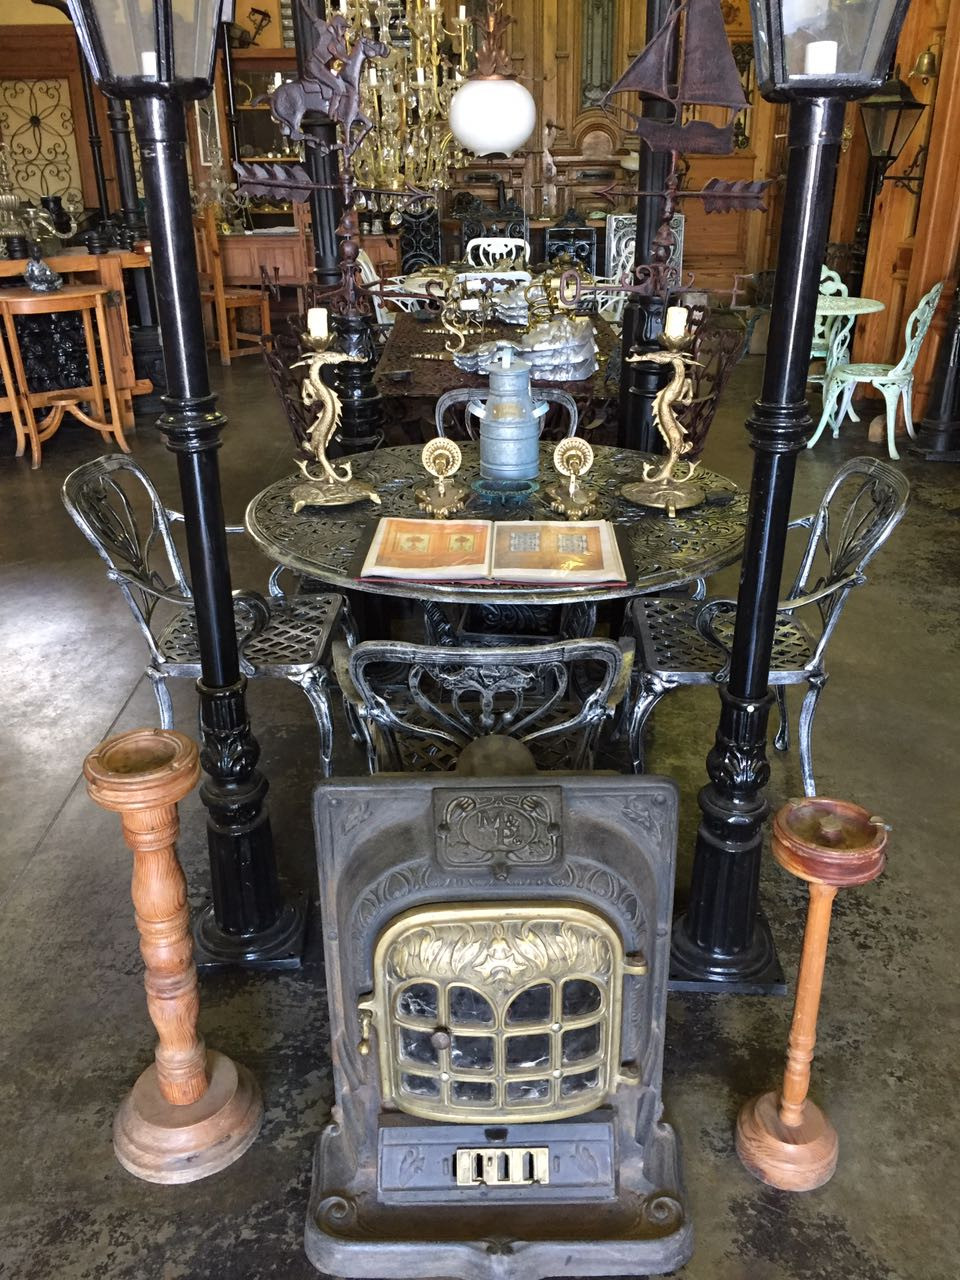 Antiguedades Curiosidades Aberturas Antiguas # Mundo Mueble Jaguel